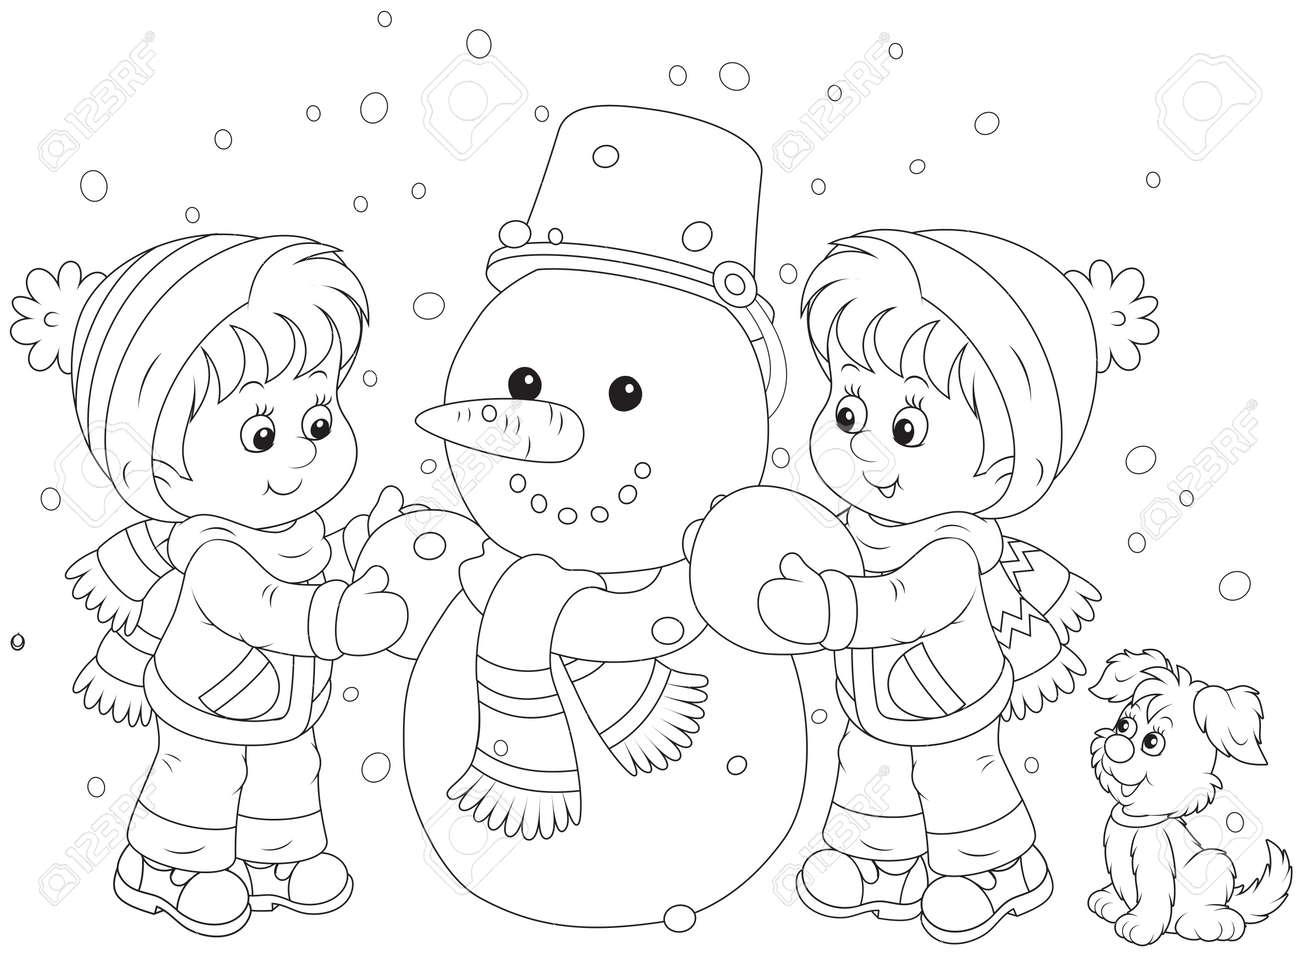 Children making a snowman - 30174486